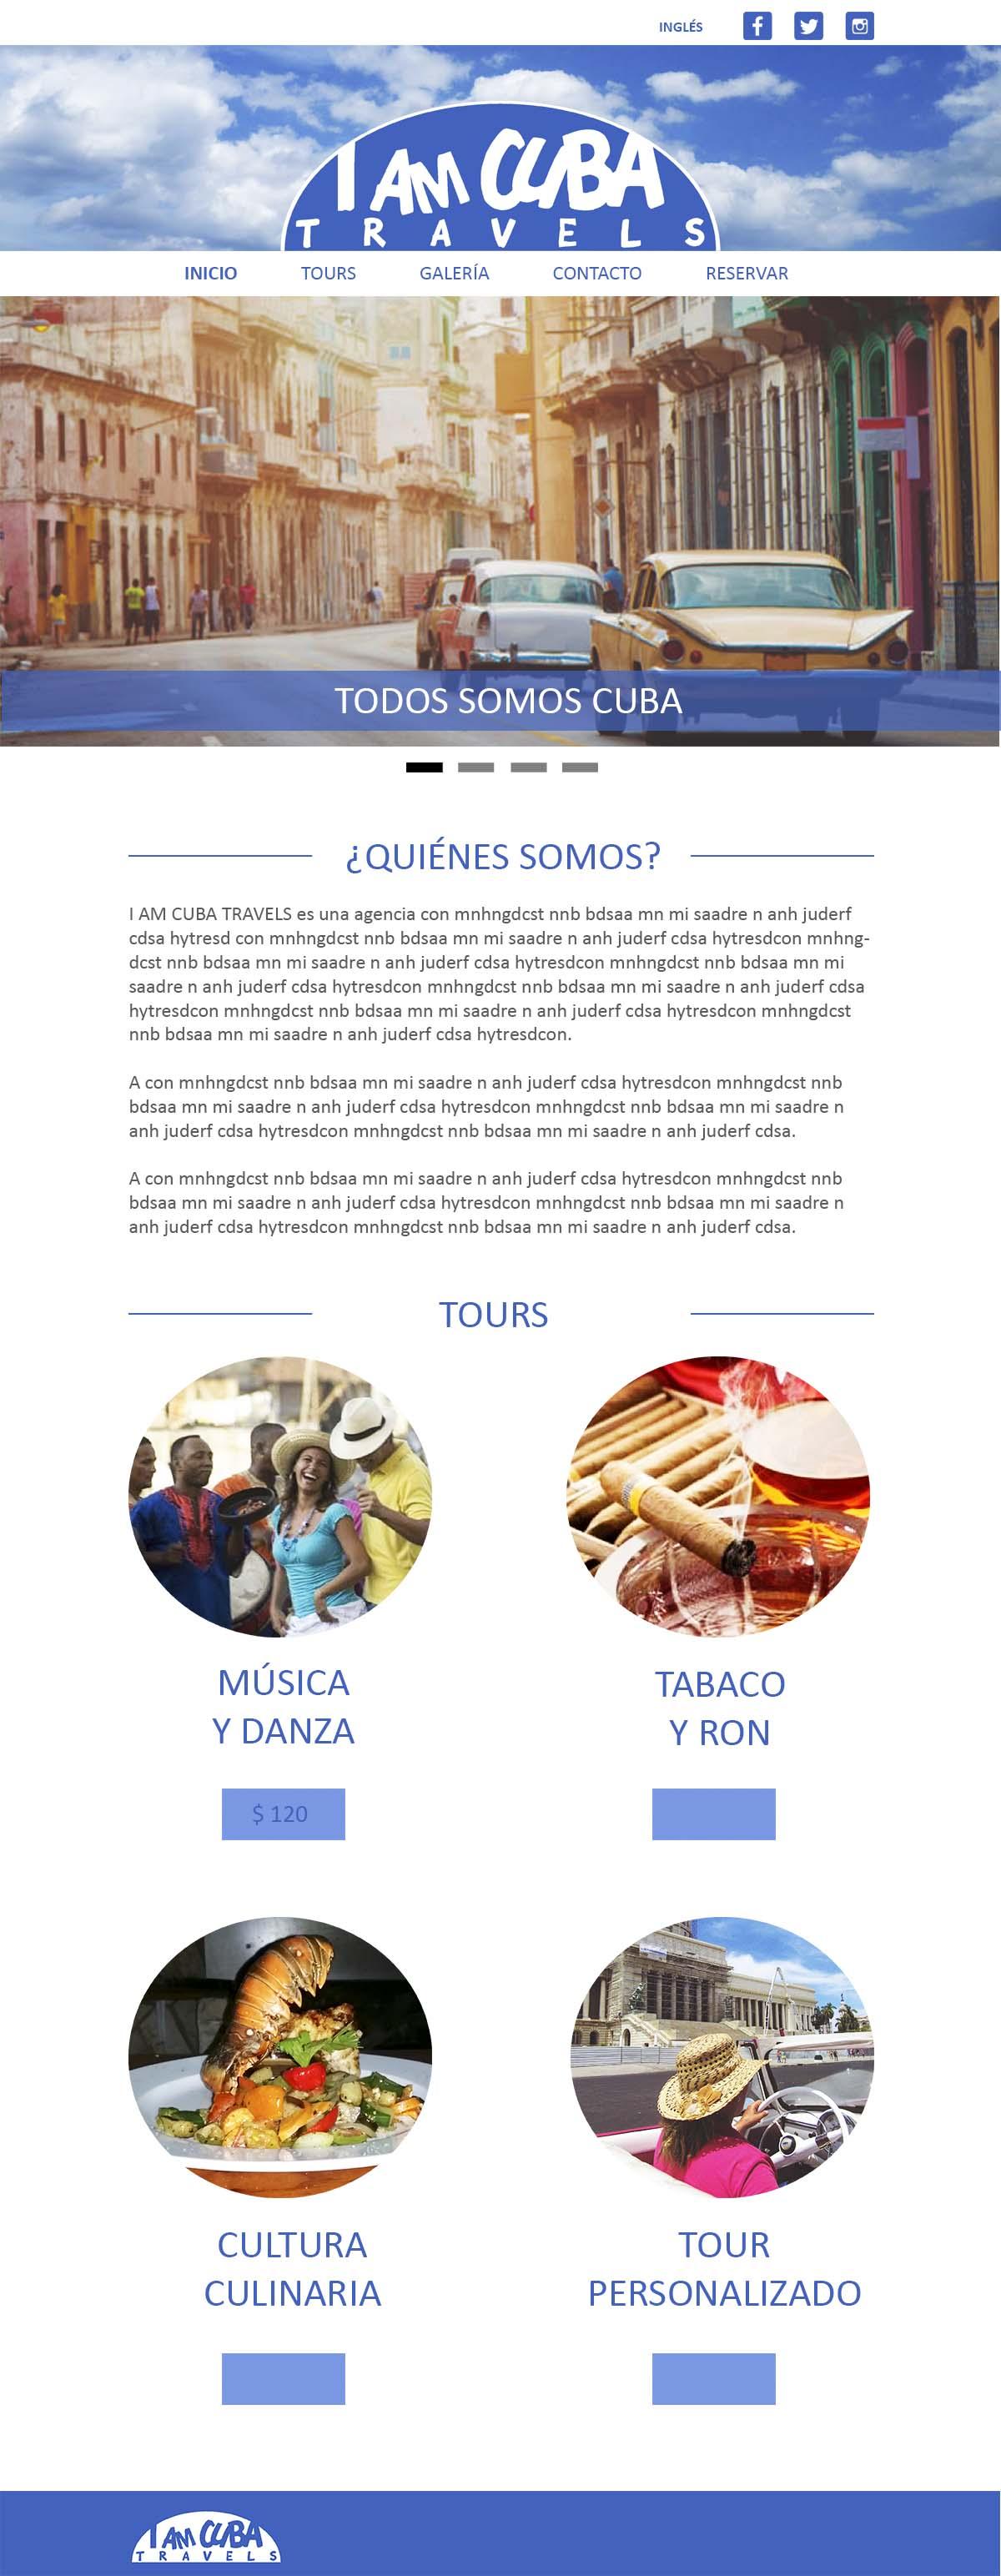 I am Cuba Travels , agencia de viajes turísticos portoda Cuba.